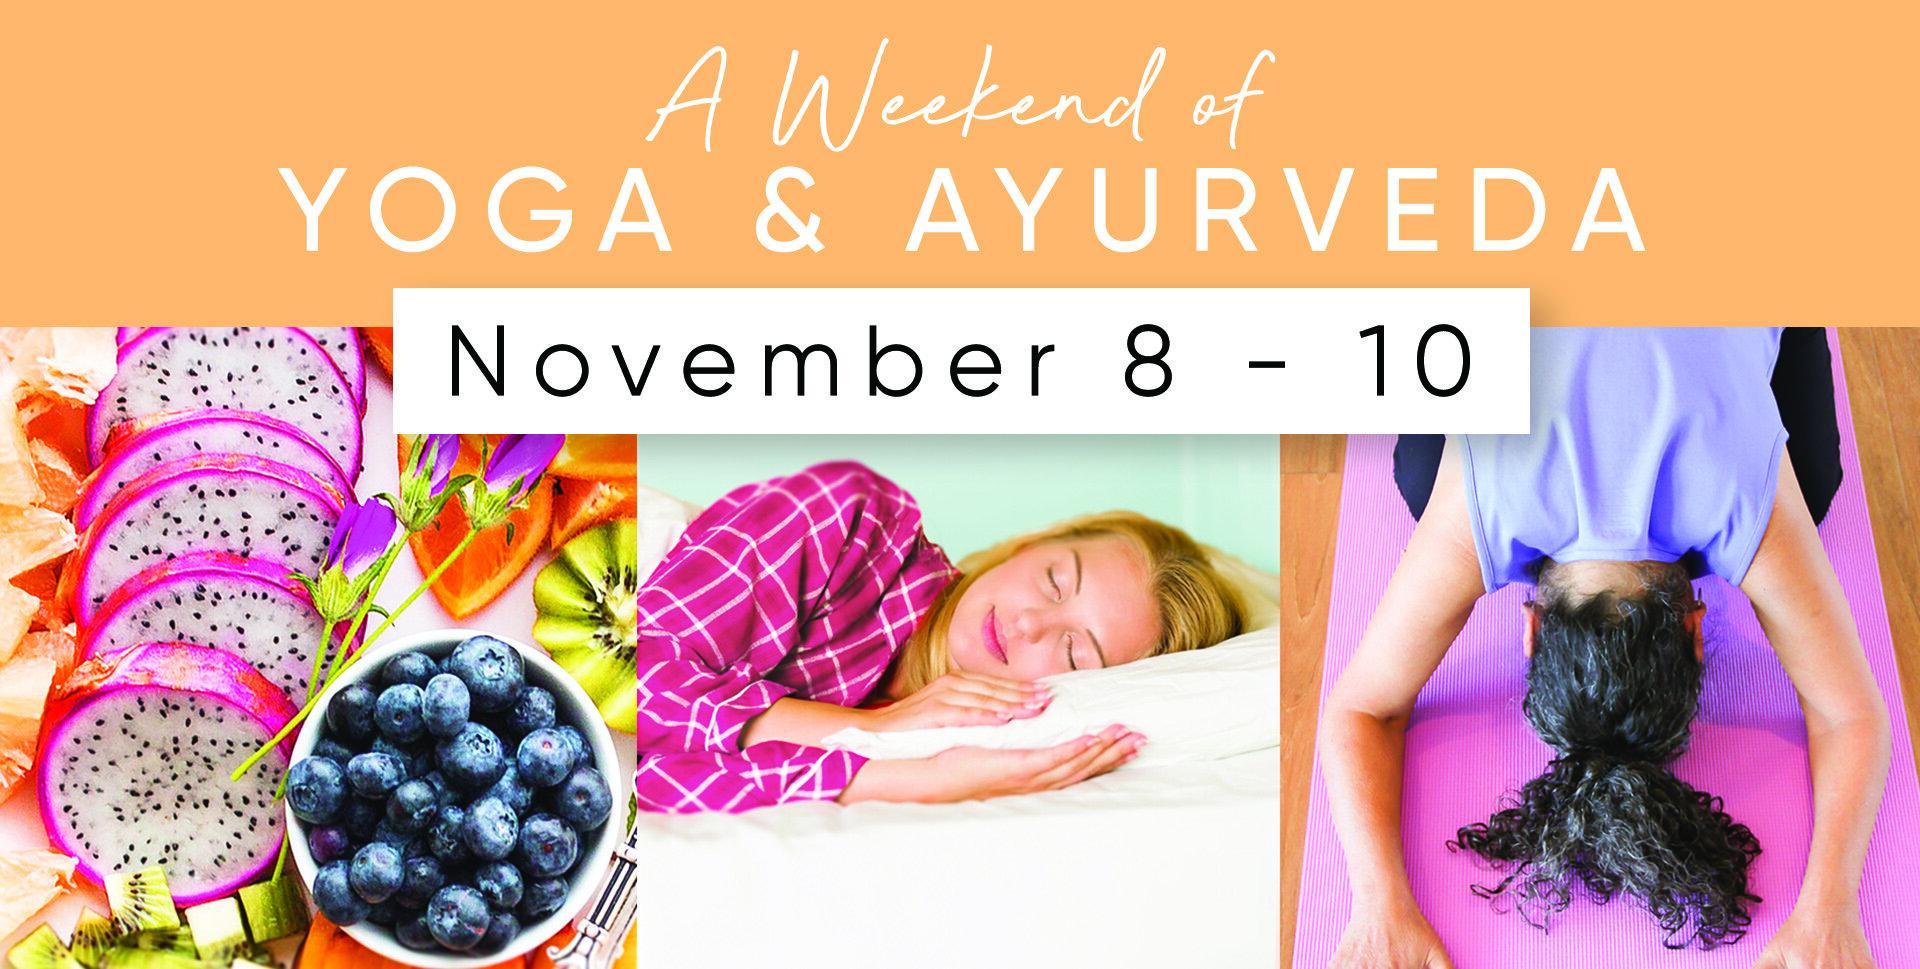 yoga and ayurveda for website.jpg